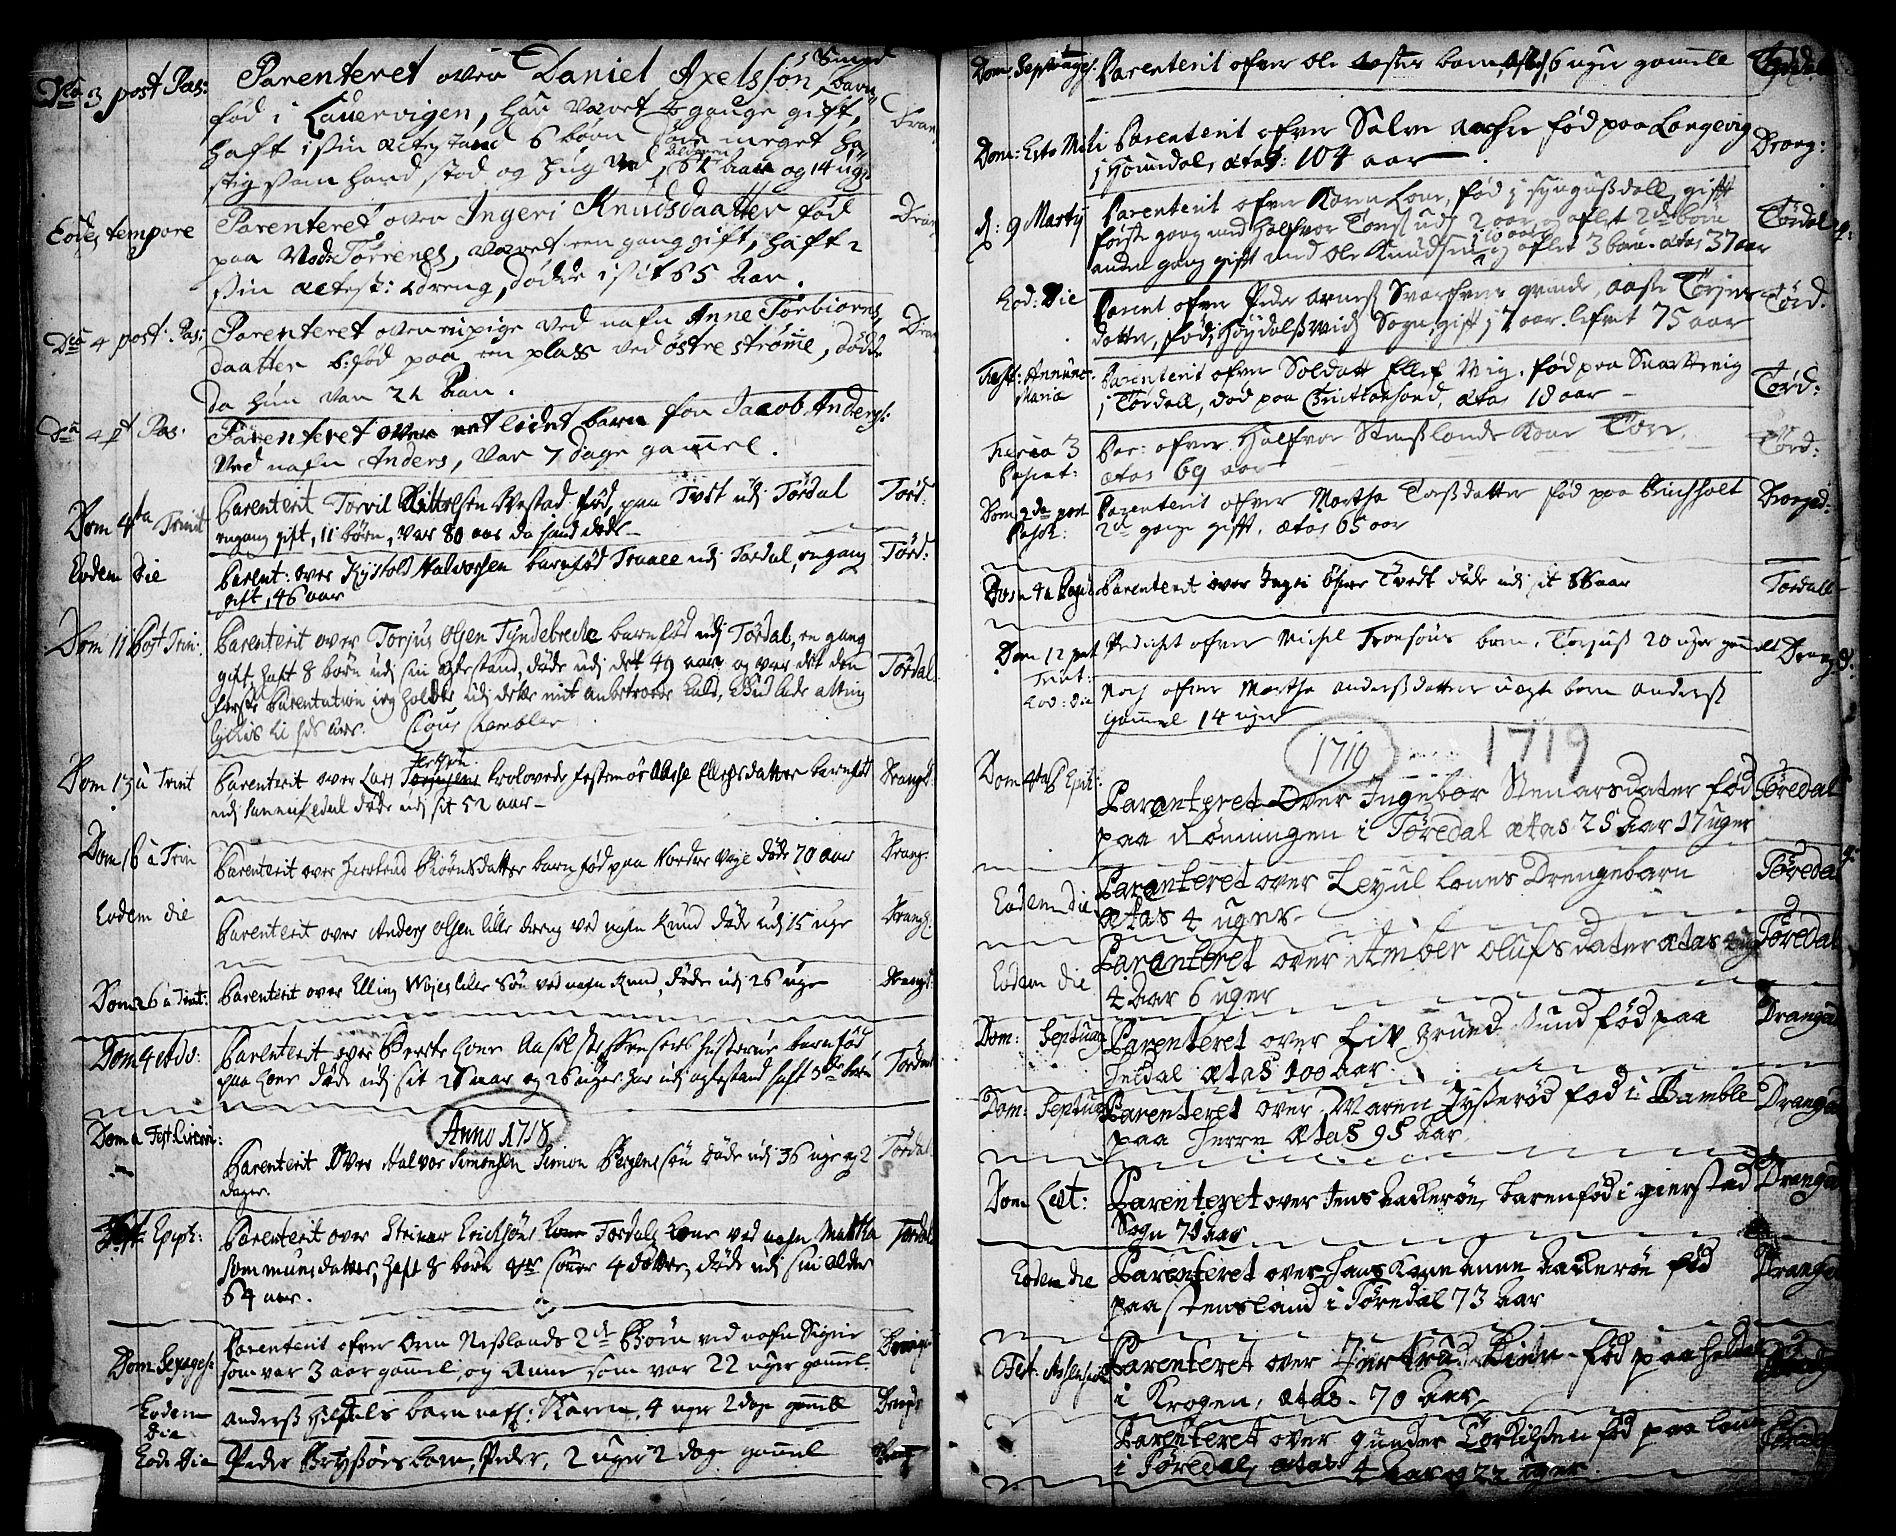 SAKO, Drangedal kirkebøker, F/Fa/L0001: Ministerialbok nr. 1, 1697-1767, s. 74